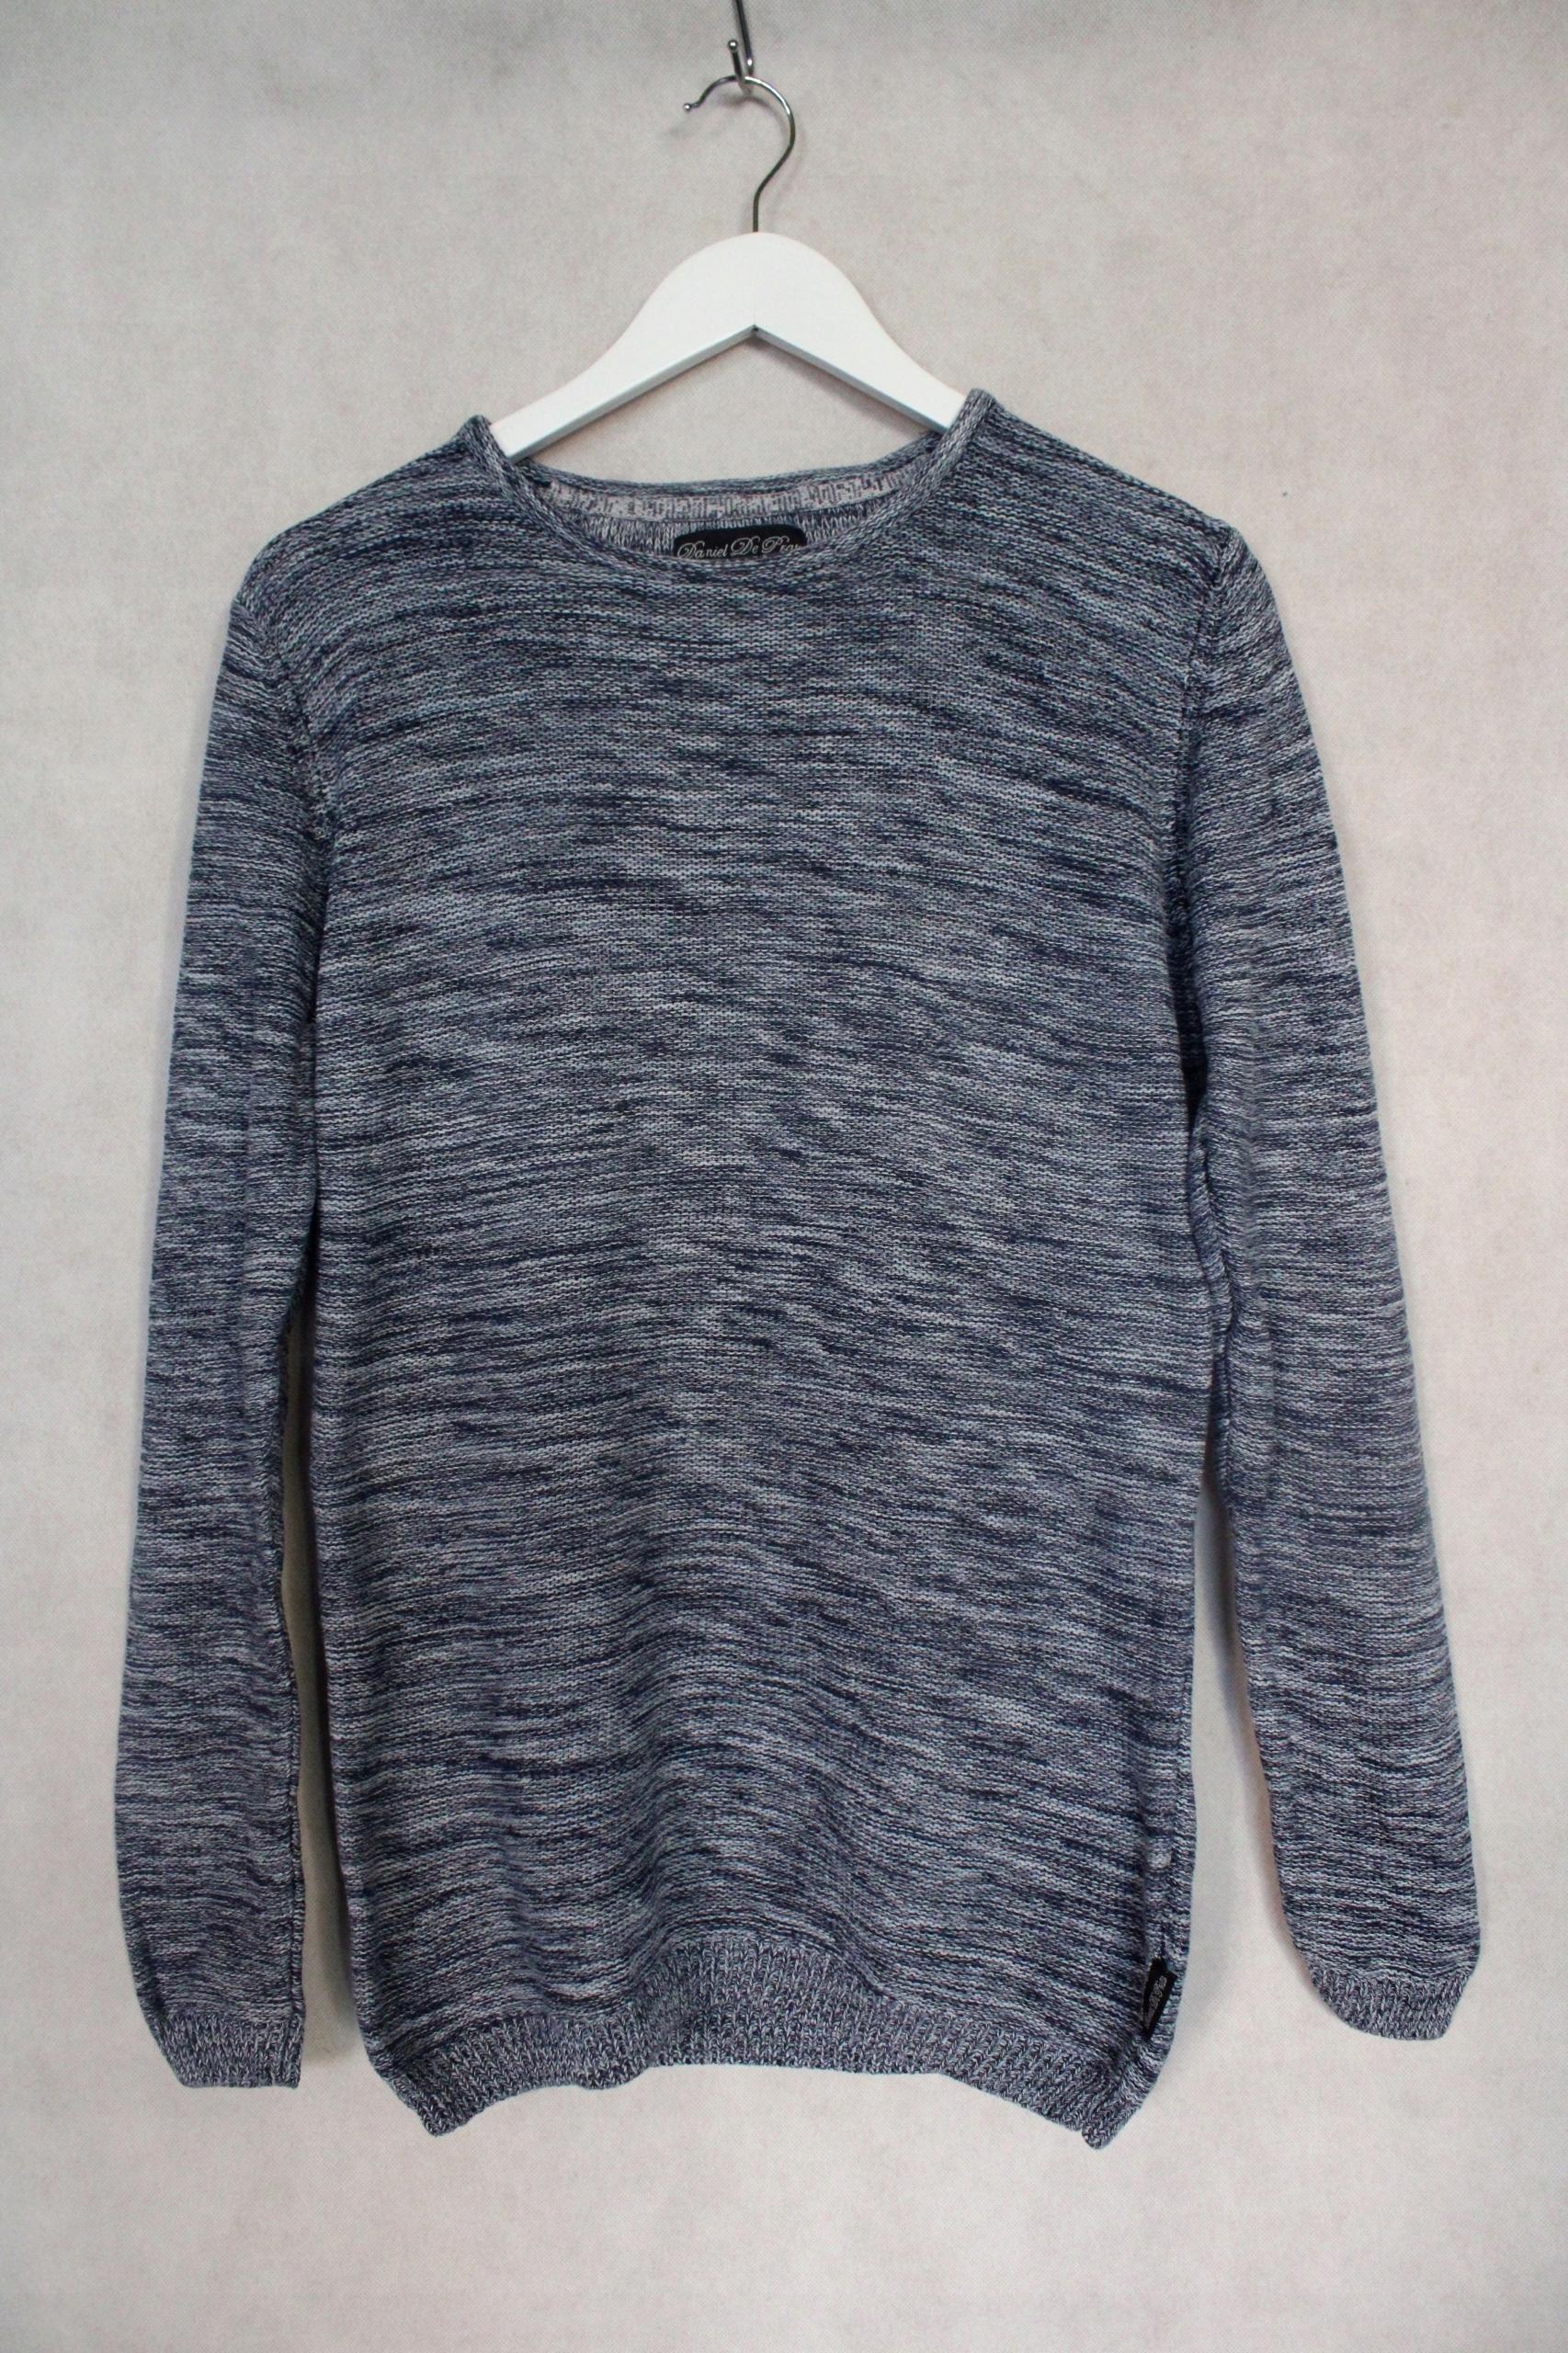 Sweter męski niebieski bawełna r. L X6